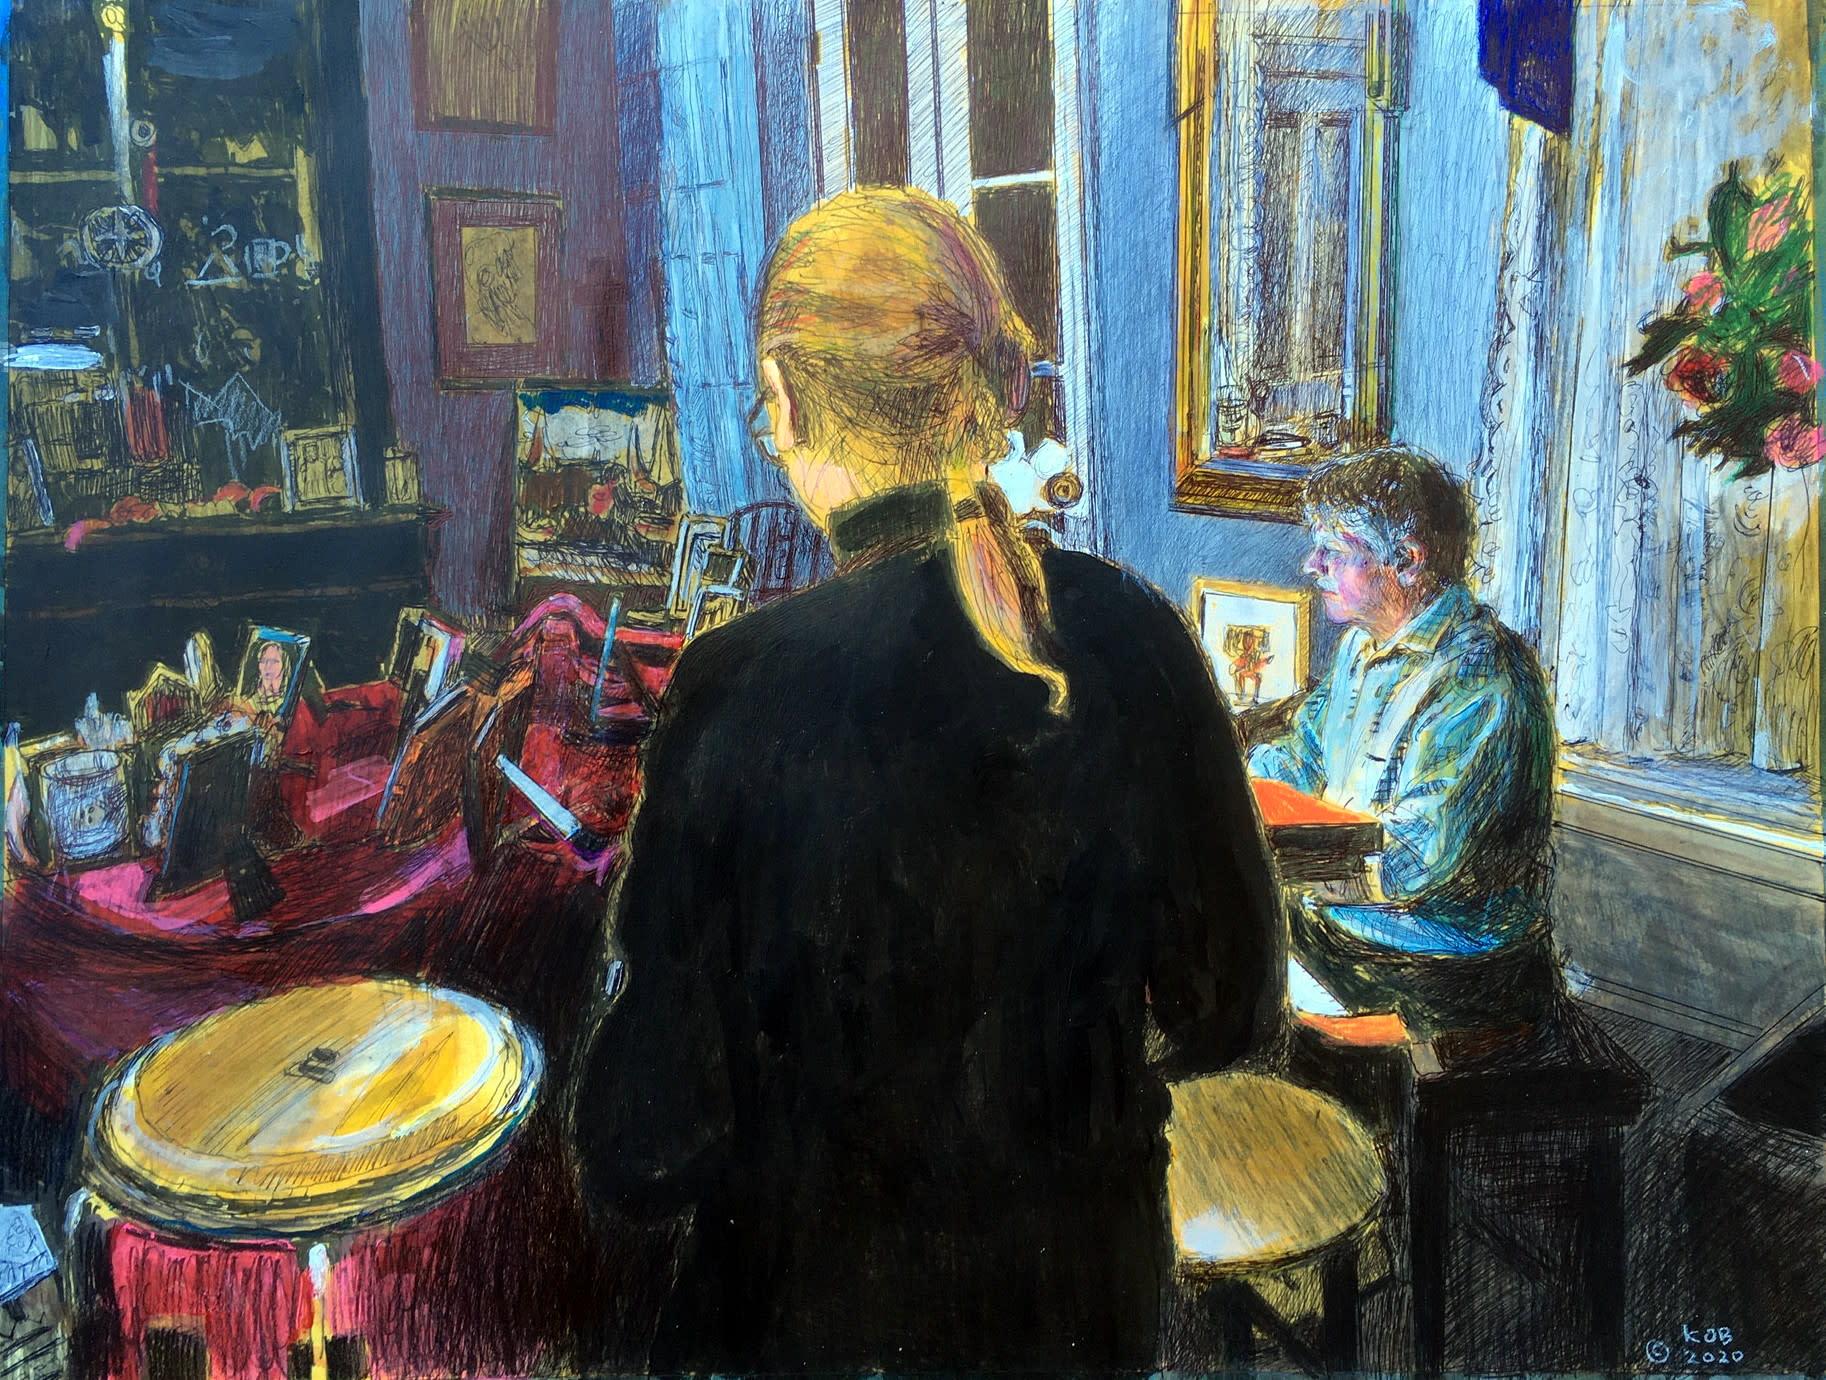 Kobrien piano music25x20acrylicprismacolorinkonpaper 1600 qoruae